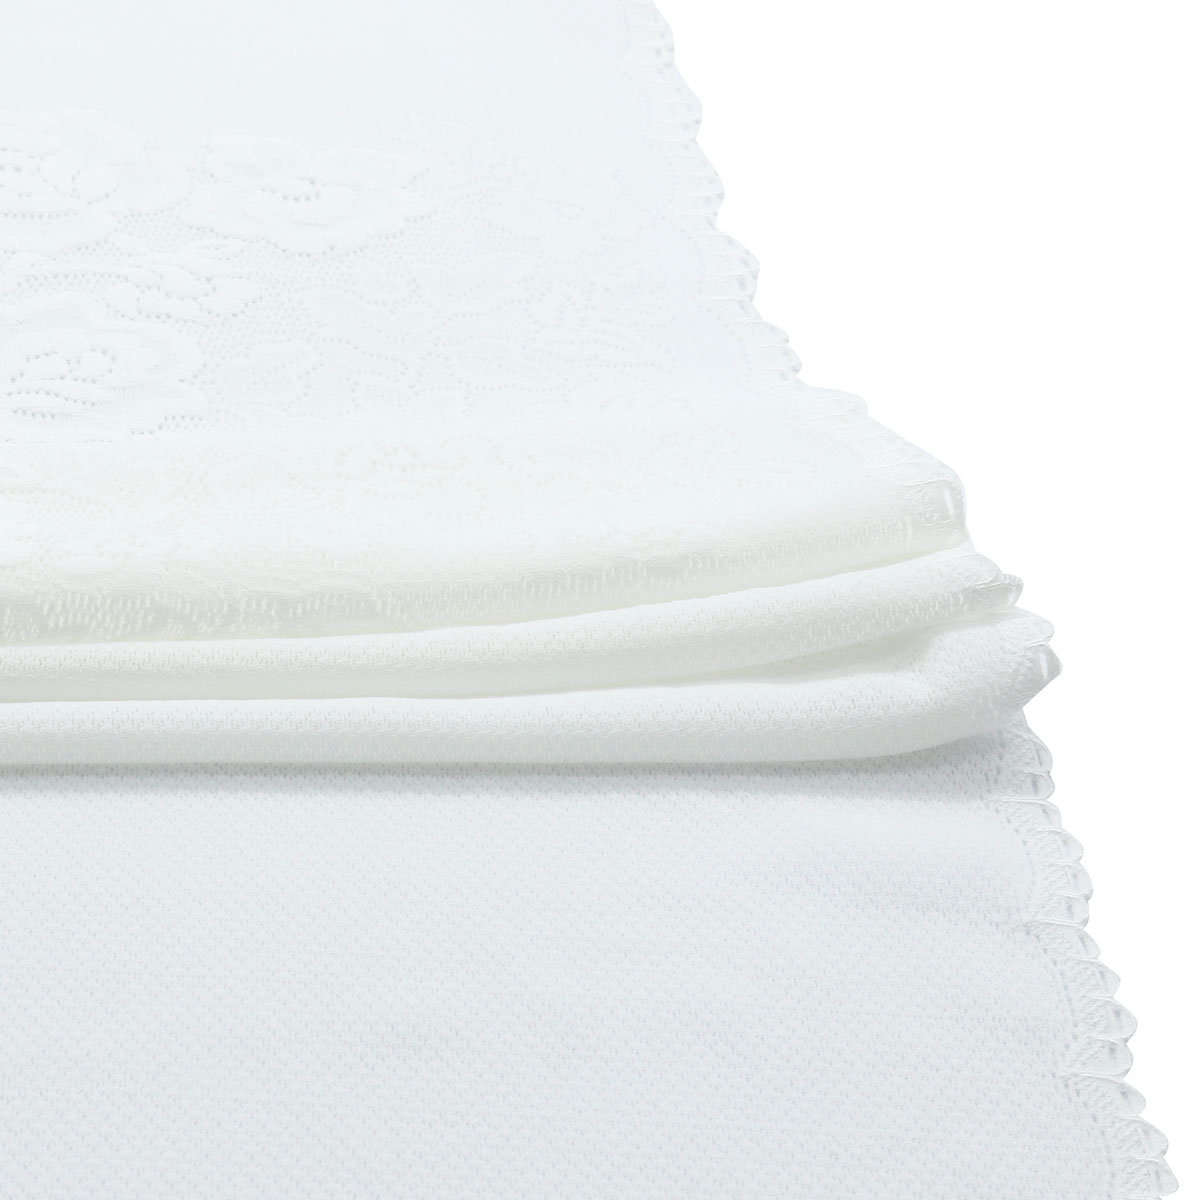 SU 122 Ткань эластичная бельевая 34 см*10